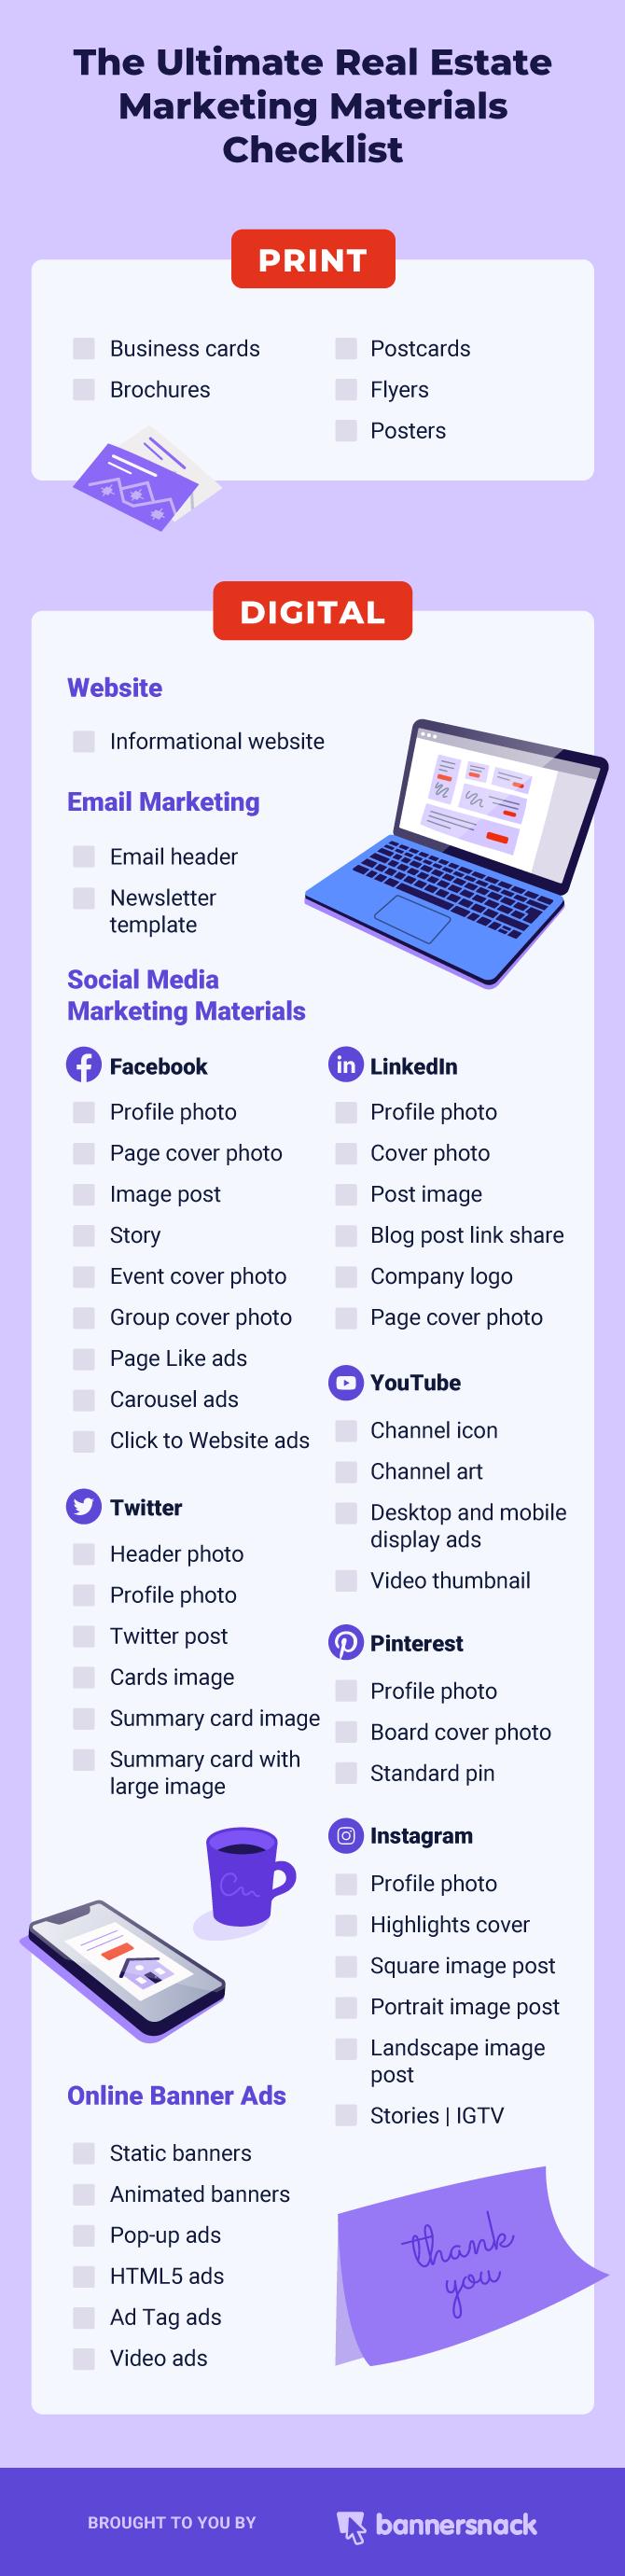 real-estate-marketing-materials-checklist-bannersnack.com